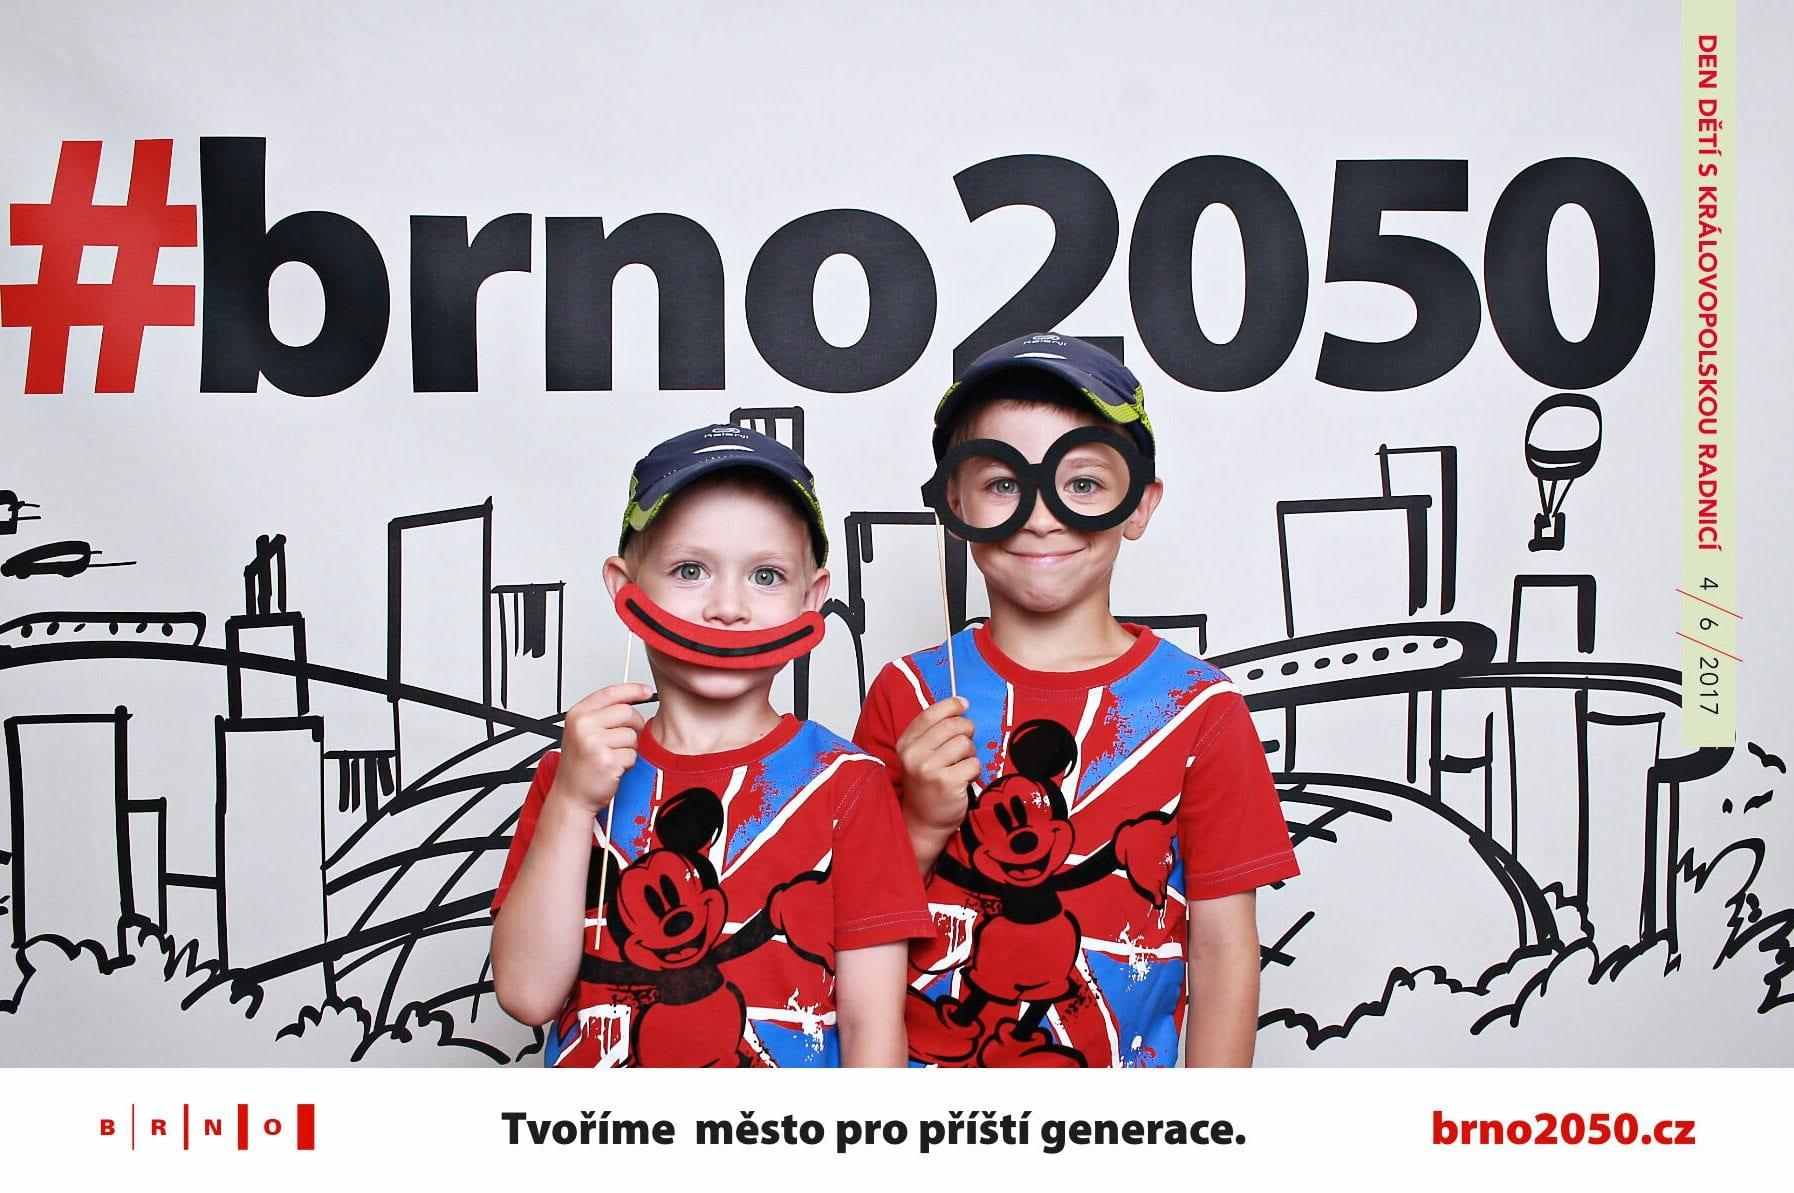 fotokoutek-brno-2050-4-6-2017-260212